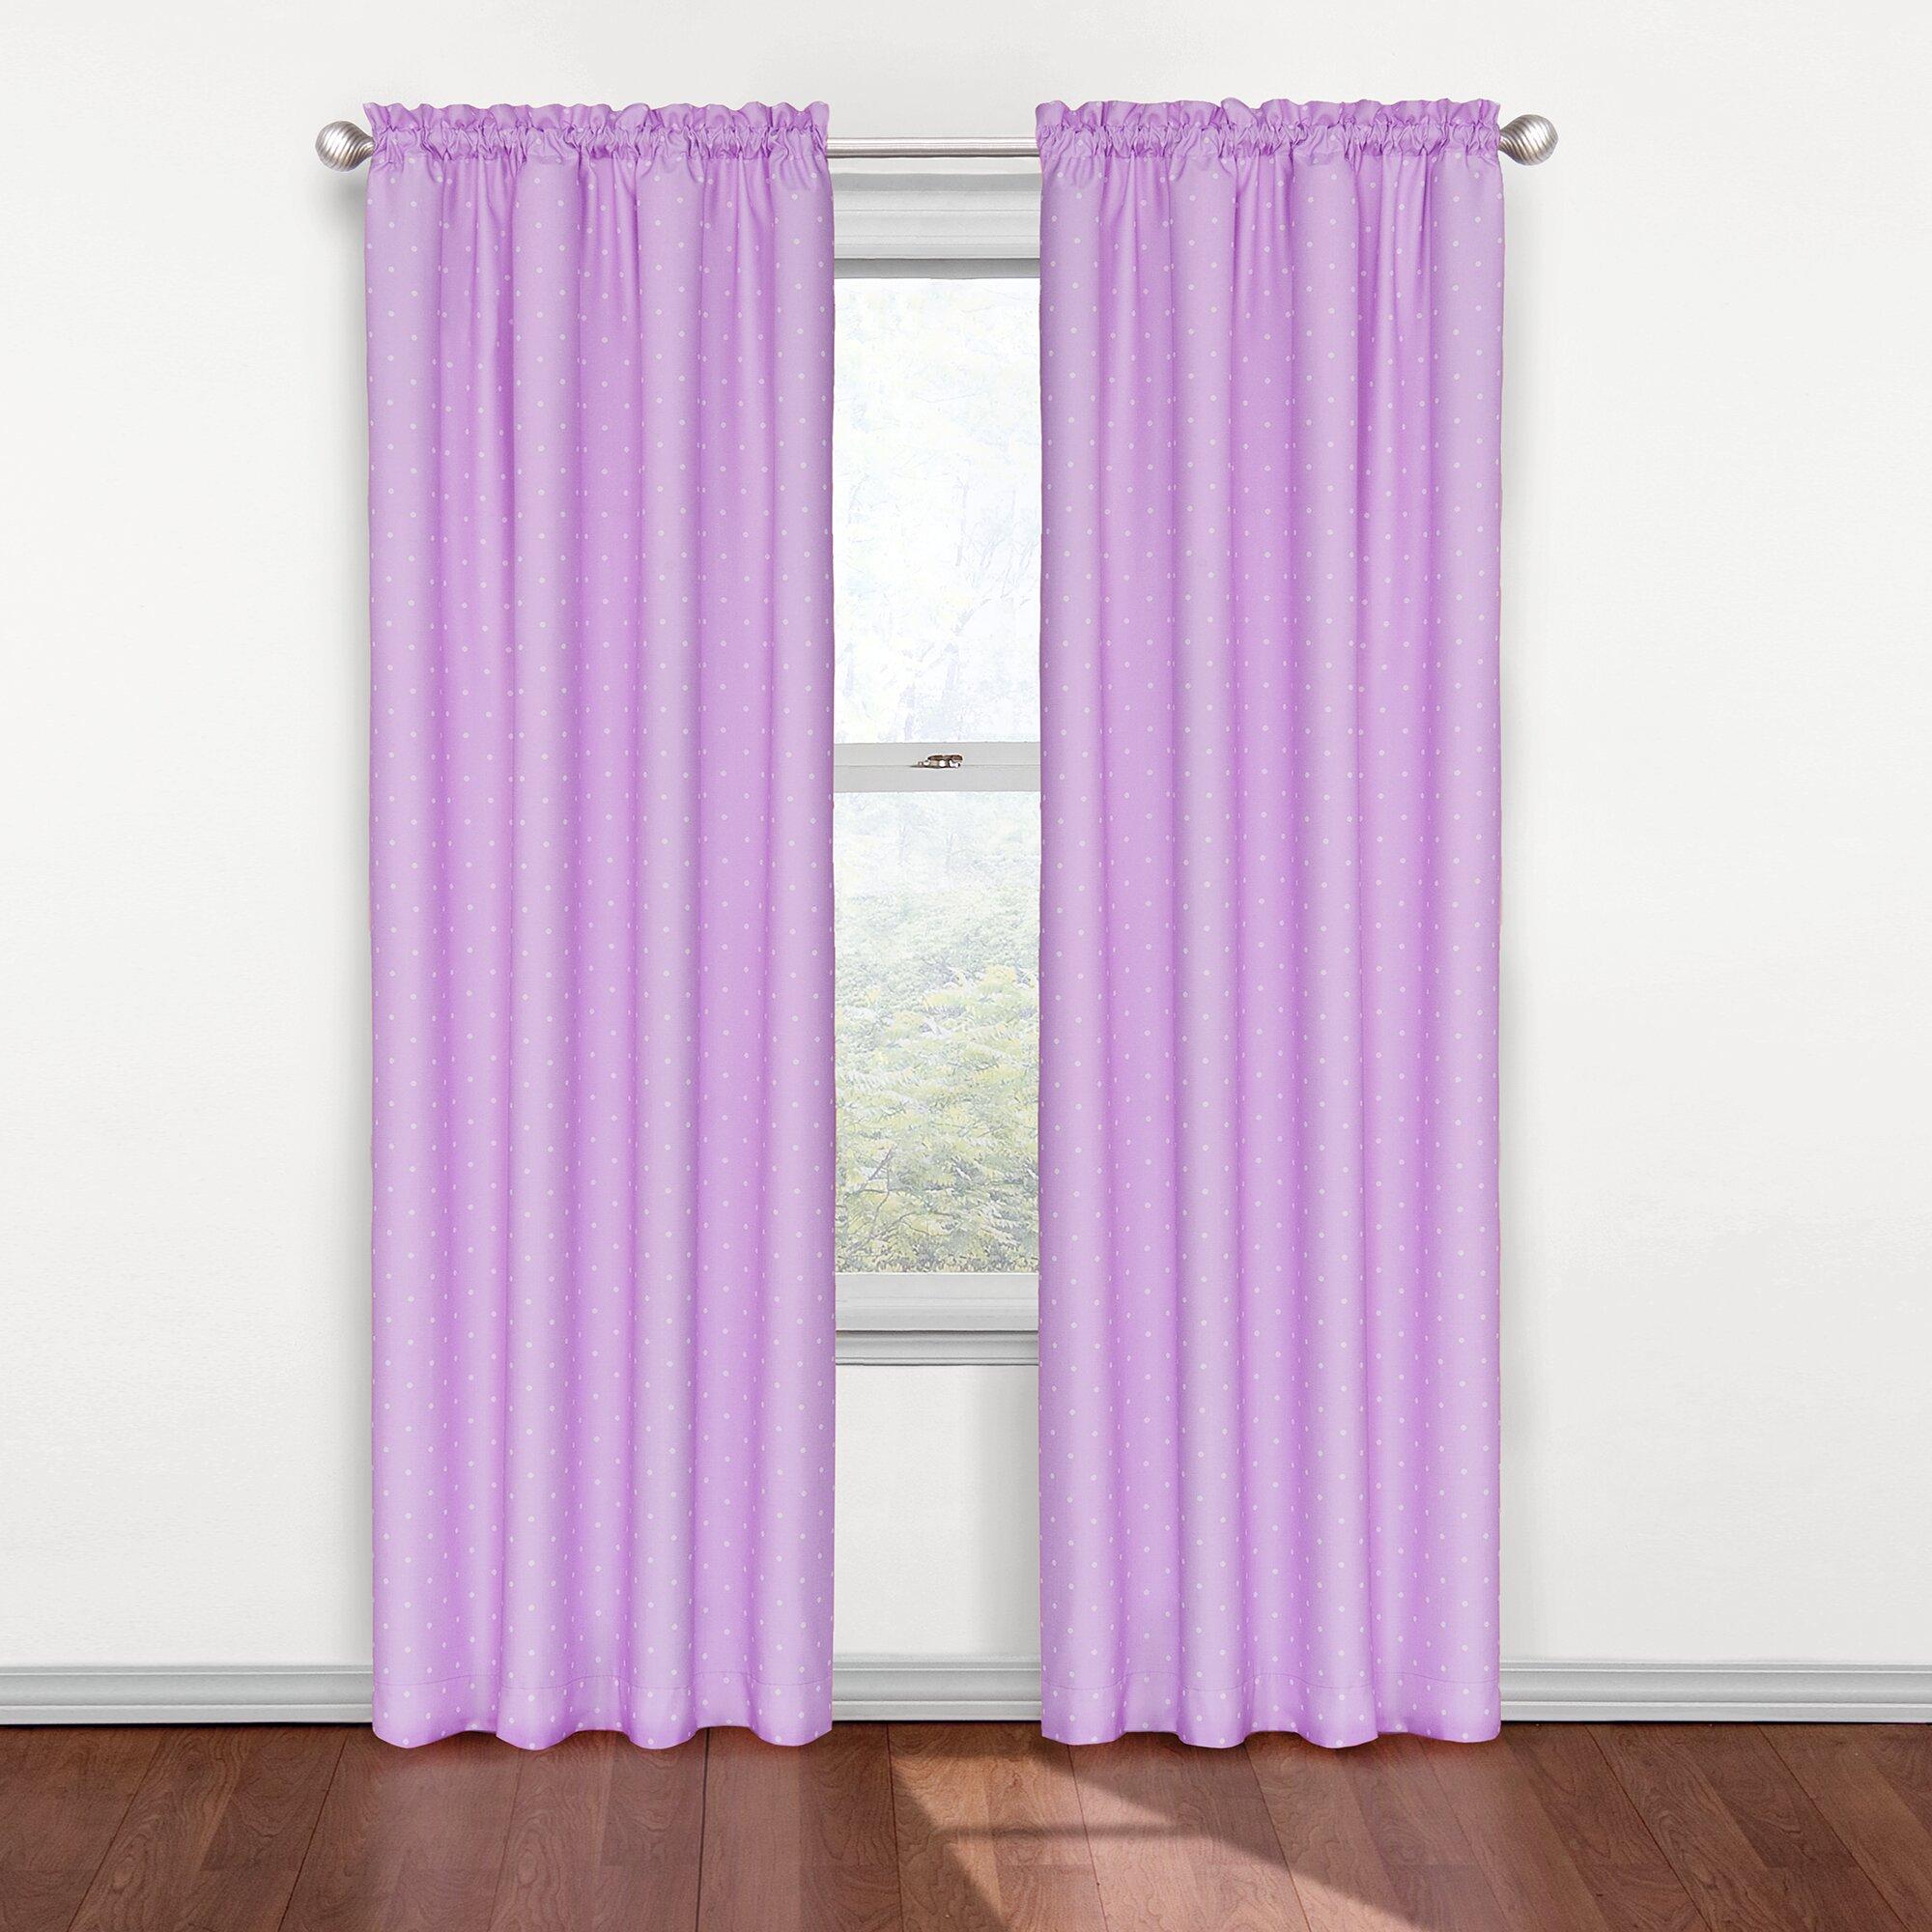 Eclipse Curtains Kids Rod Pocket Single Blackout Curtain Panel Reviews Wayfair